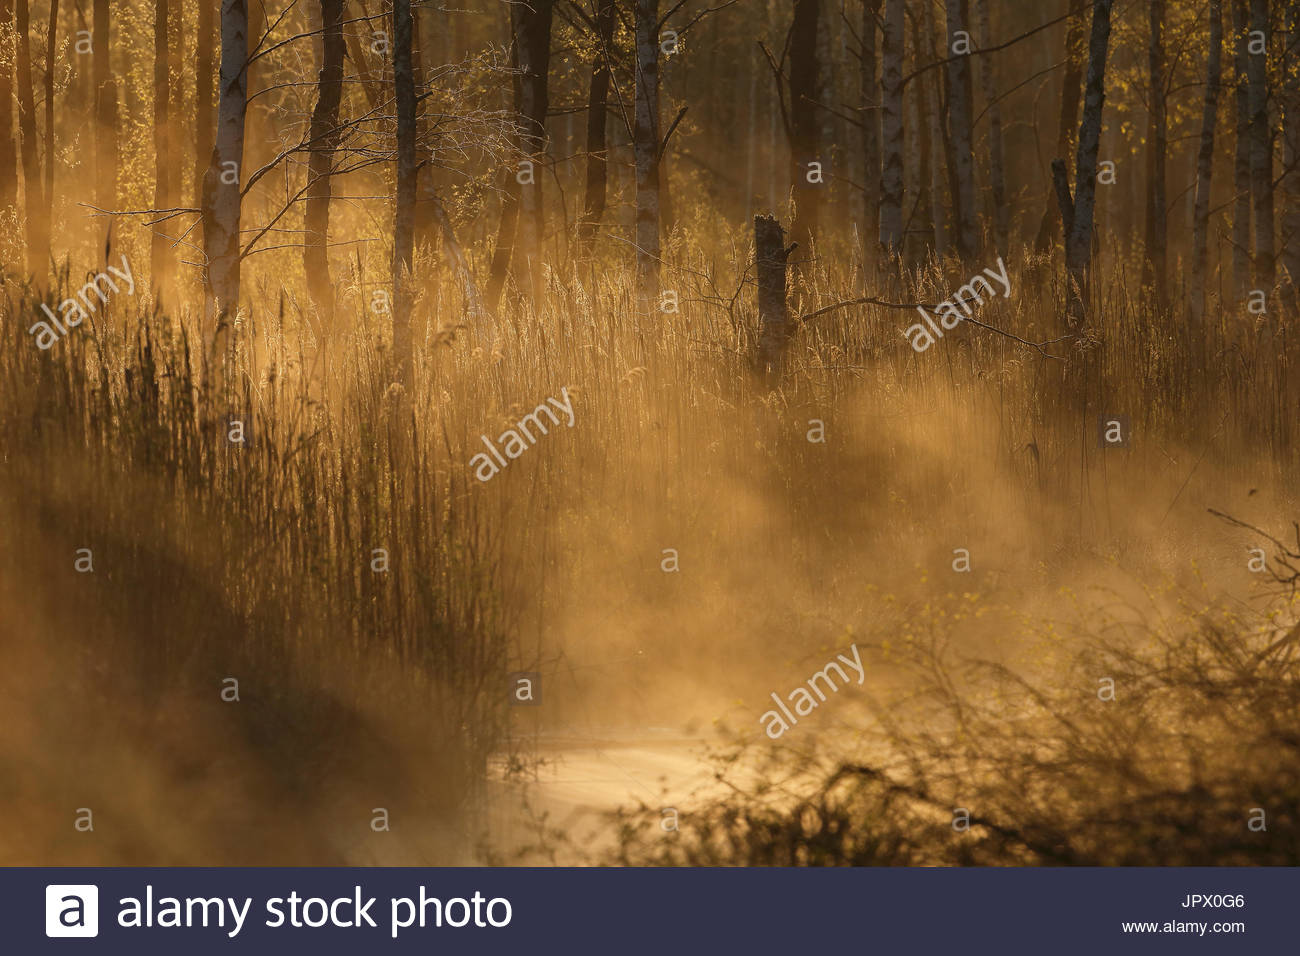 Swamp at dawn - Chernobyl area Ukraine - Stock Image